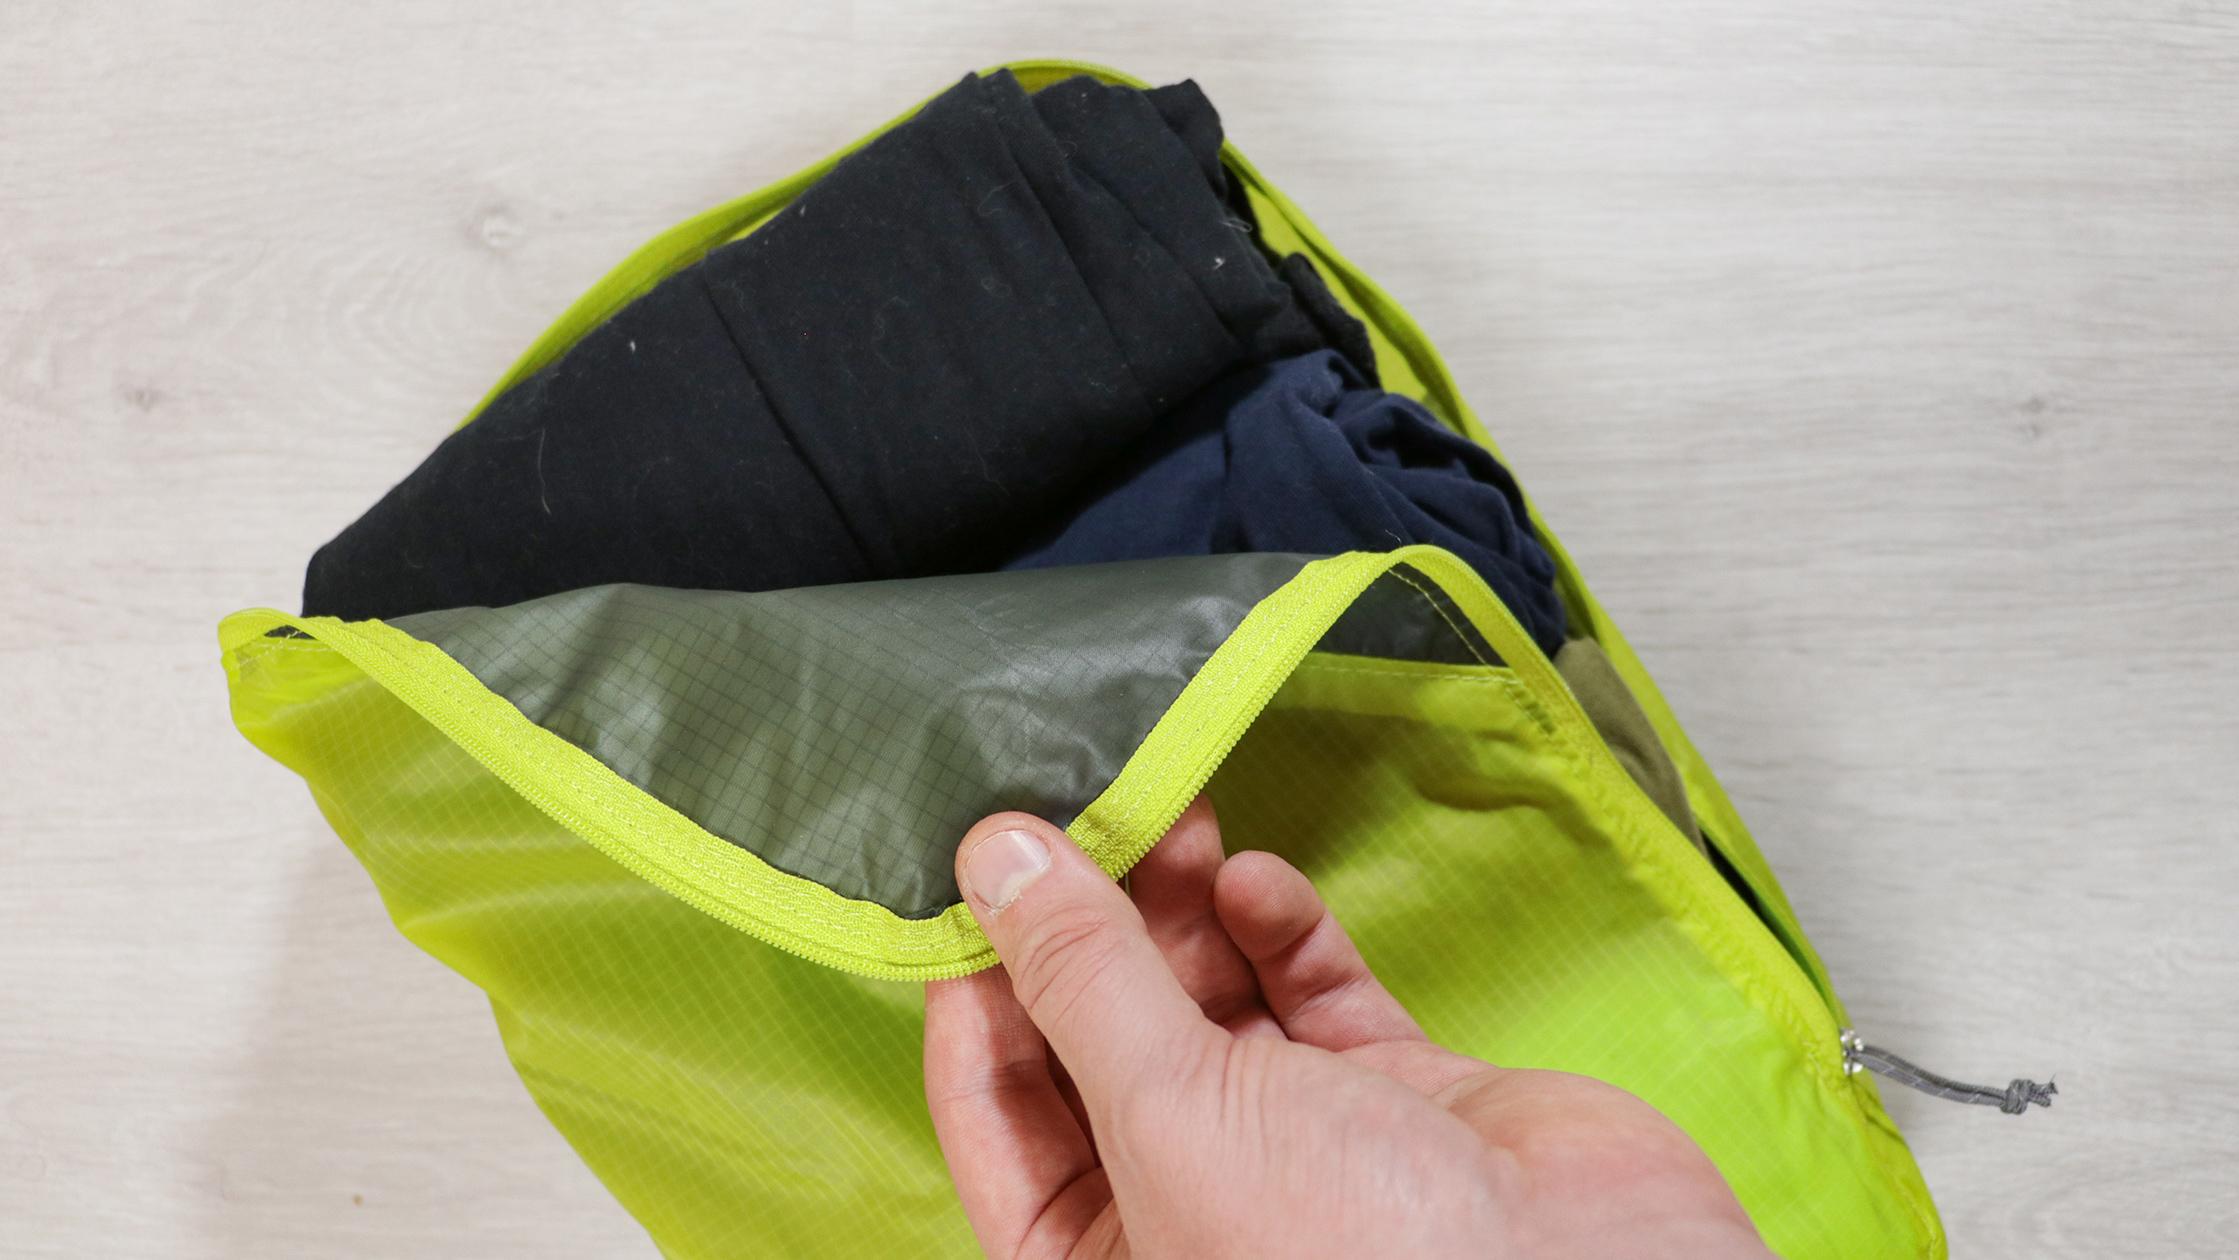 Osprey Ultralight Packing Cube 40D Ripstop Nylon Material